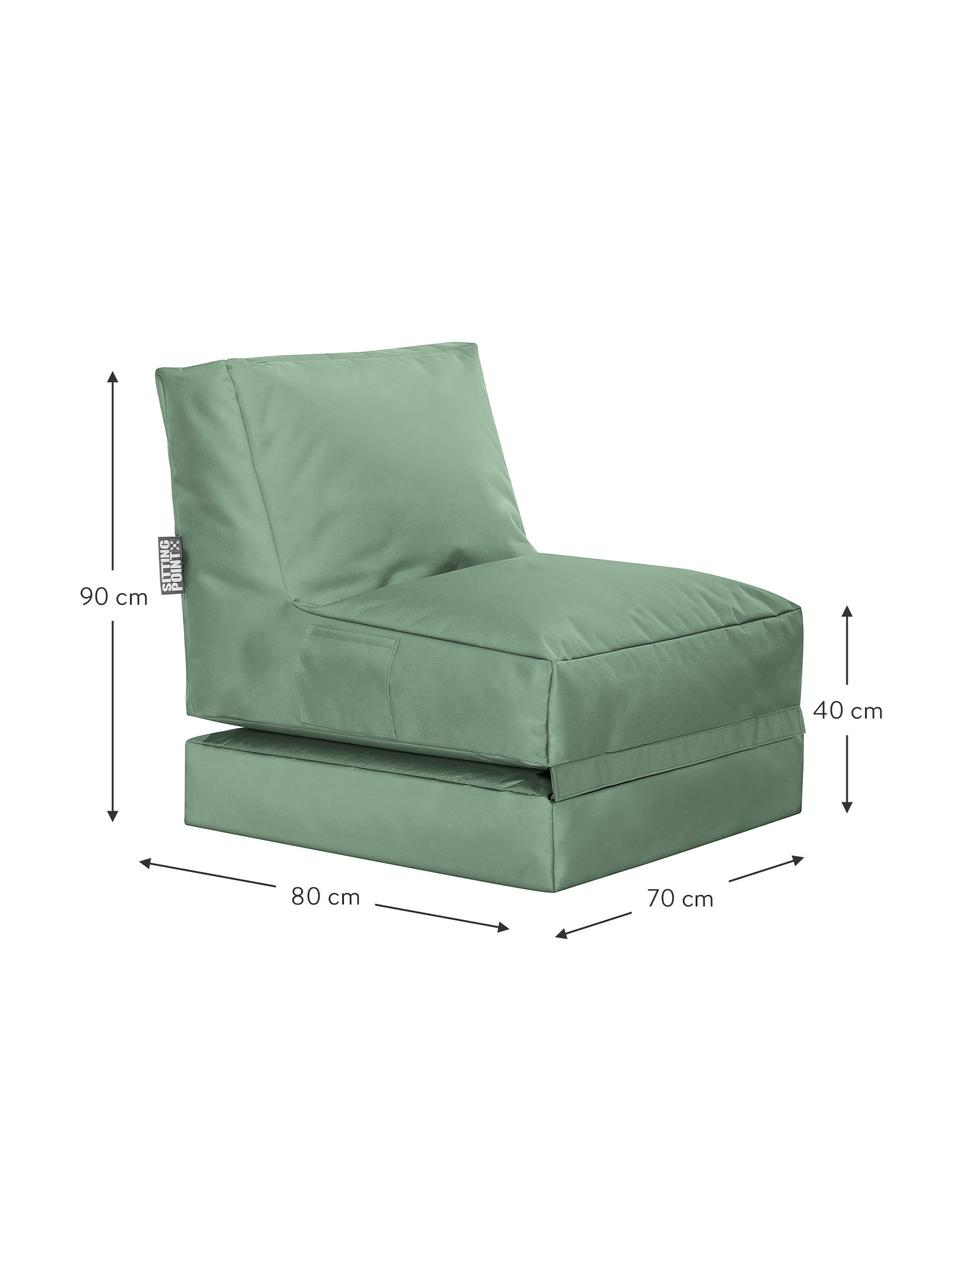 Poltrona letto da giardino Pop Up, Rivestimento: 100% poliestere Interno c, Verde salvia, Larg. 70 x Prof. 90 cm